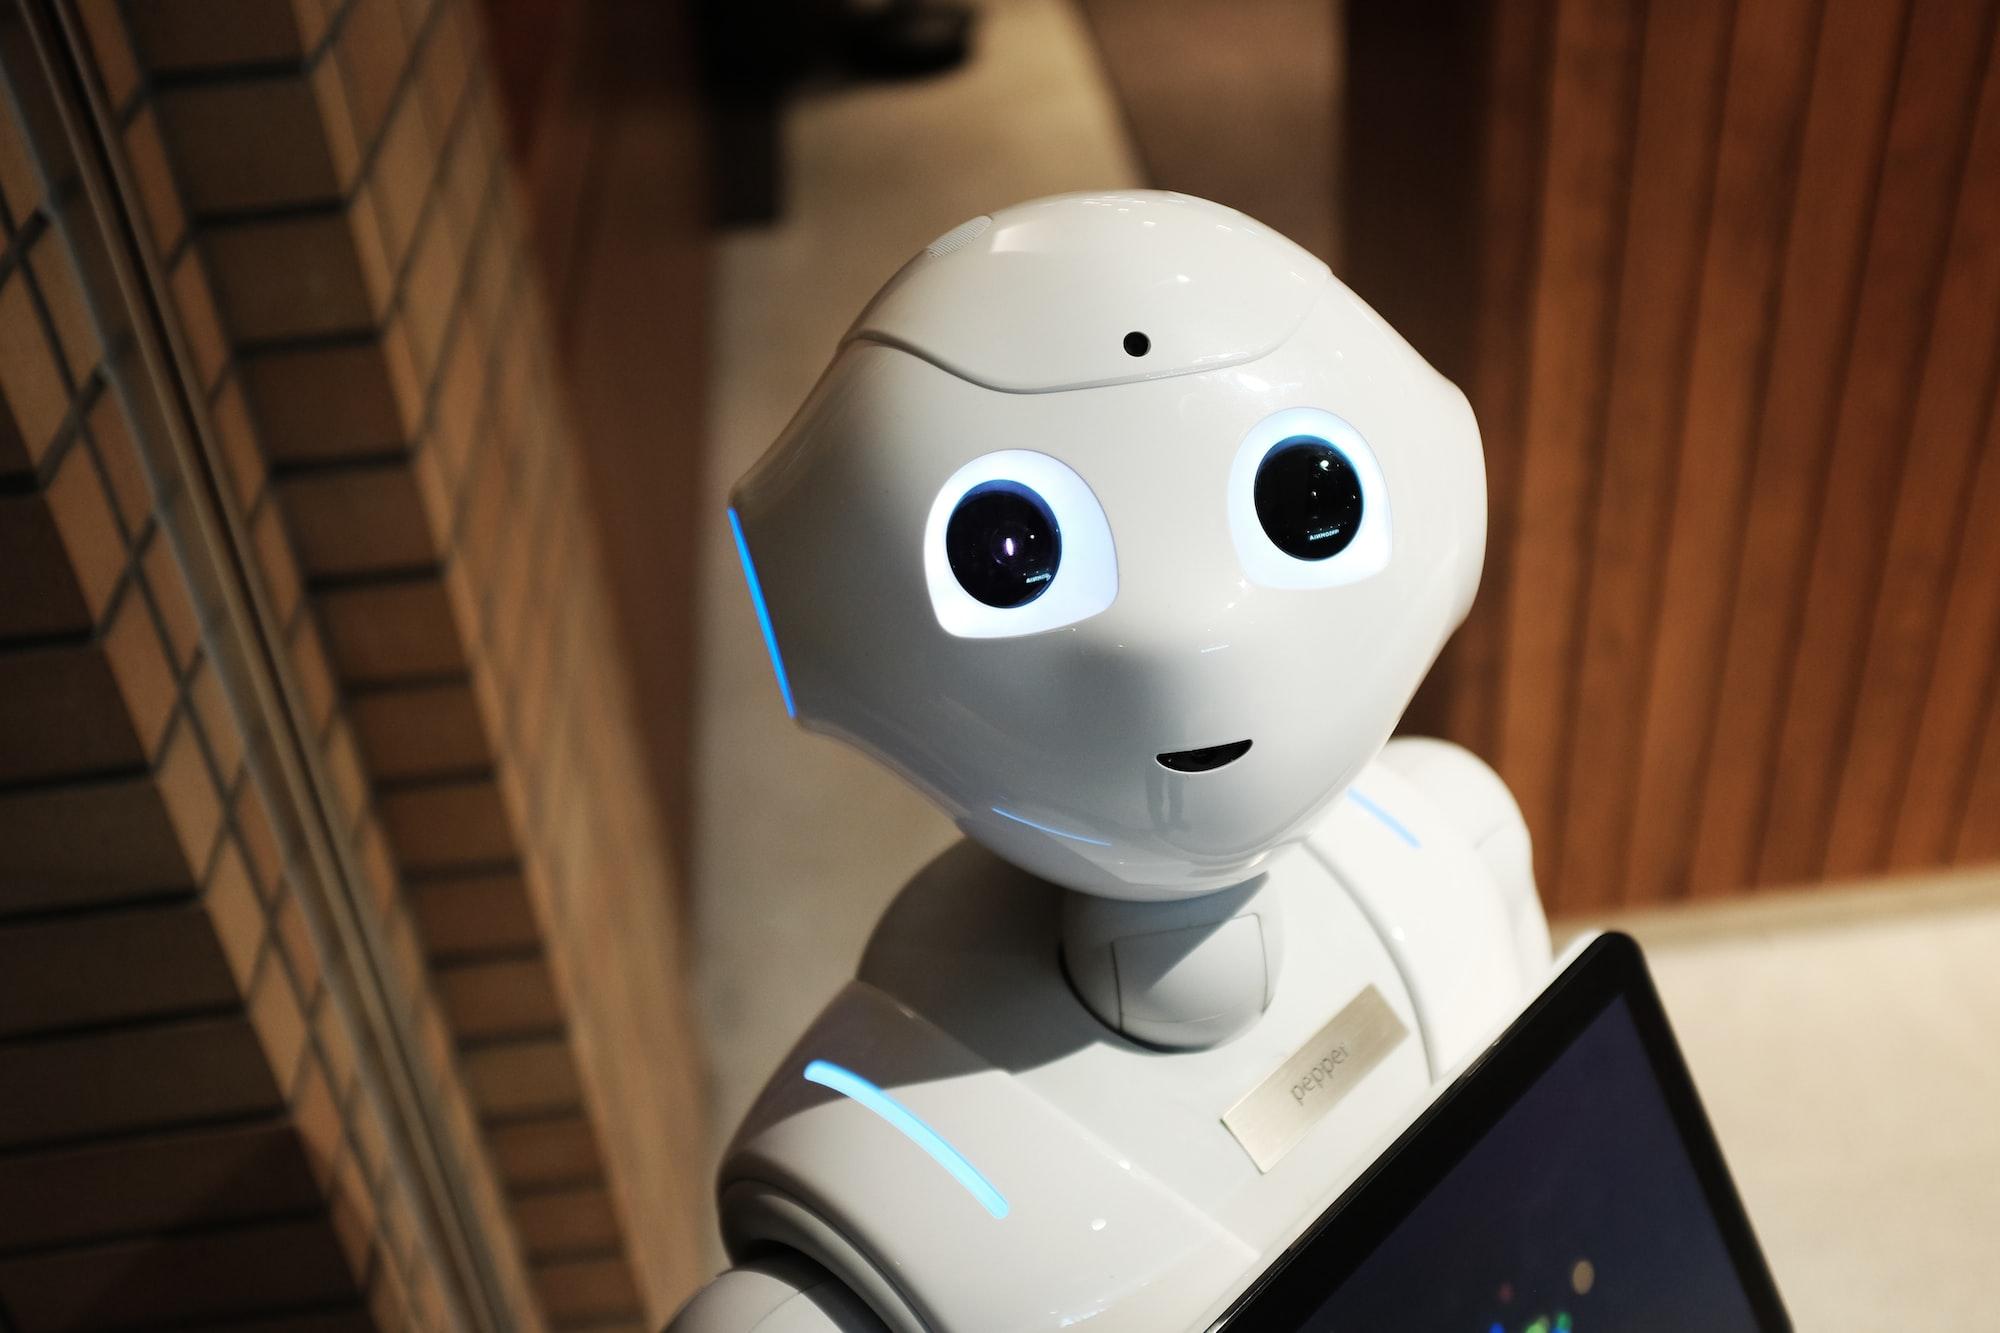 Trading Bot คือคำตอบของกลยุทธ์การเทรดจริงหรือ?